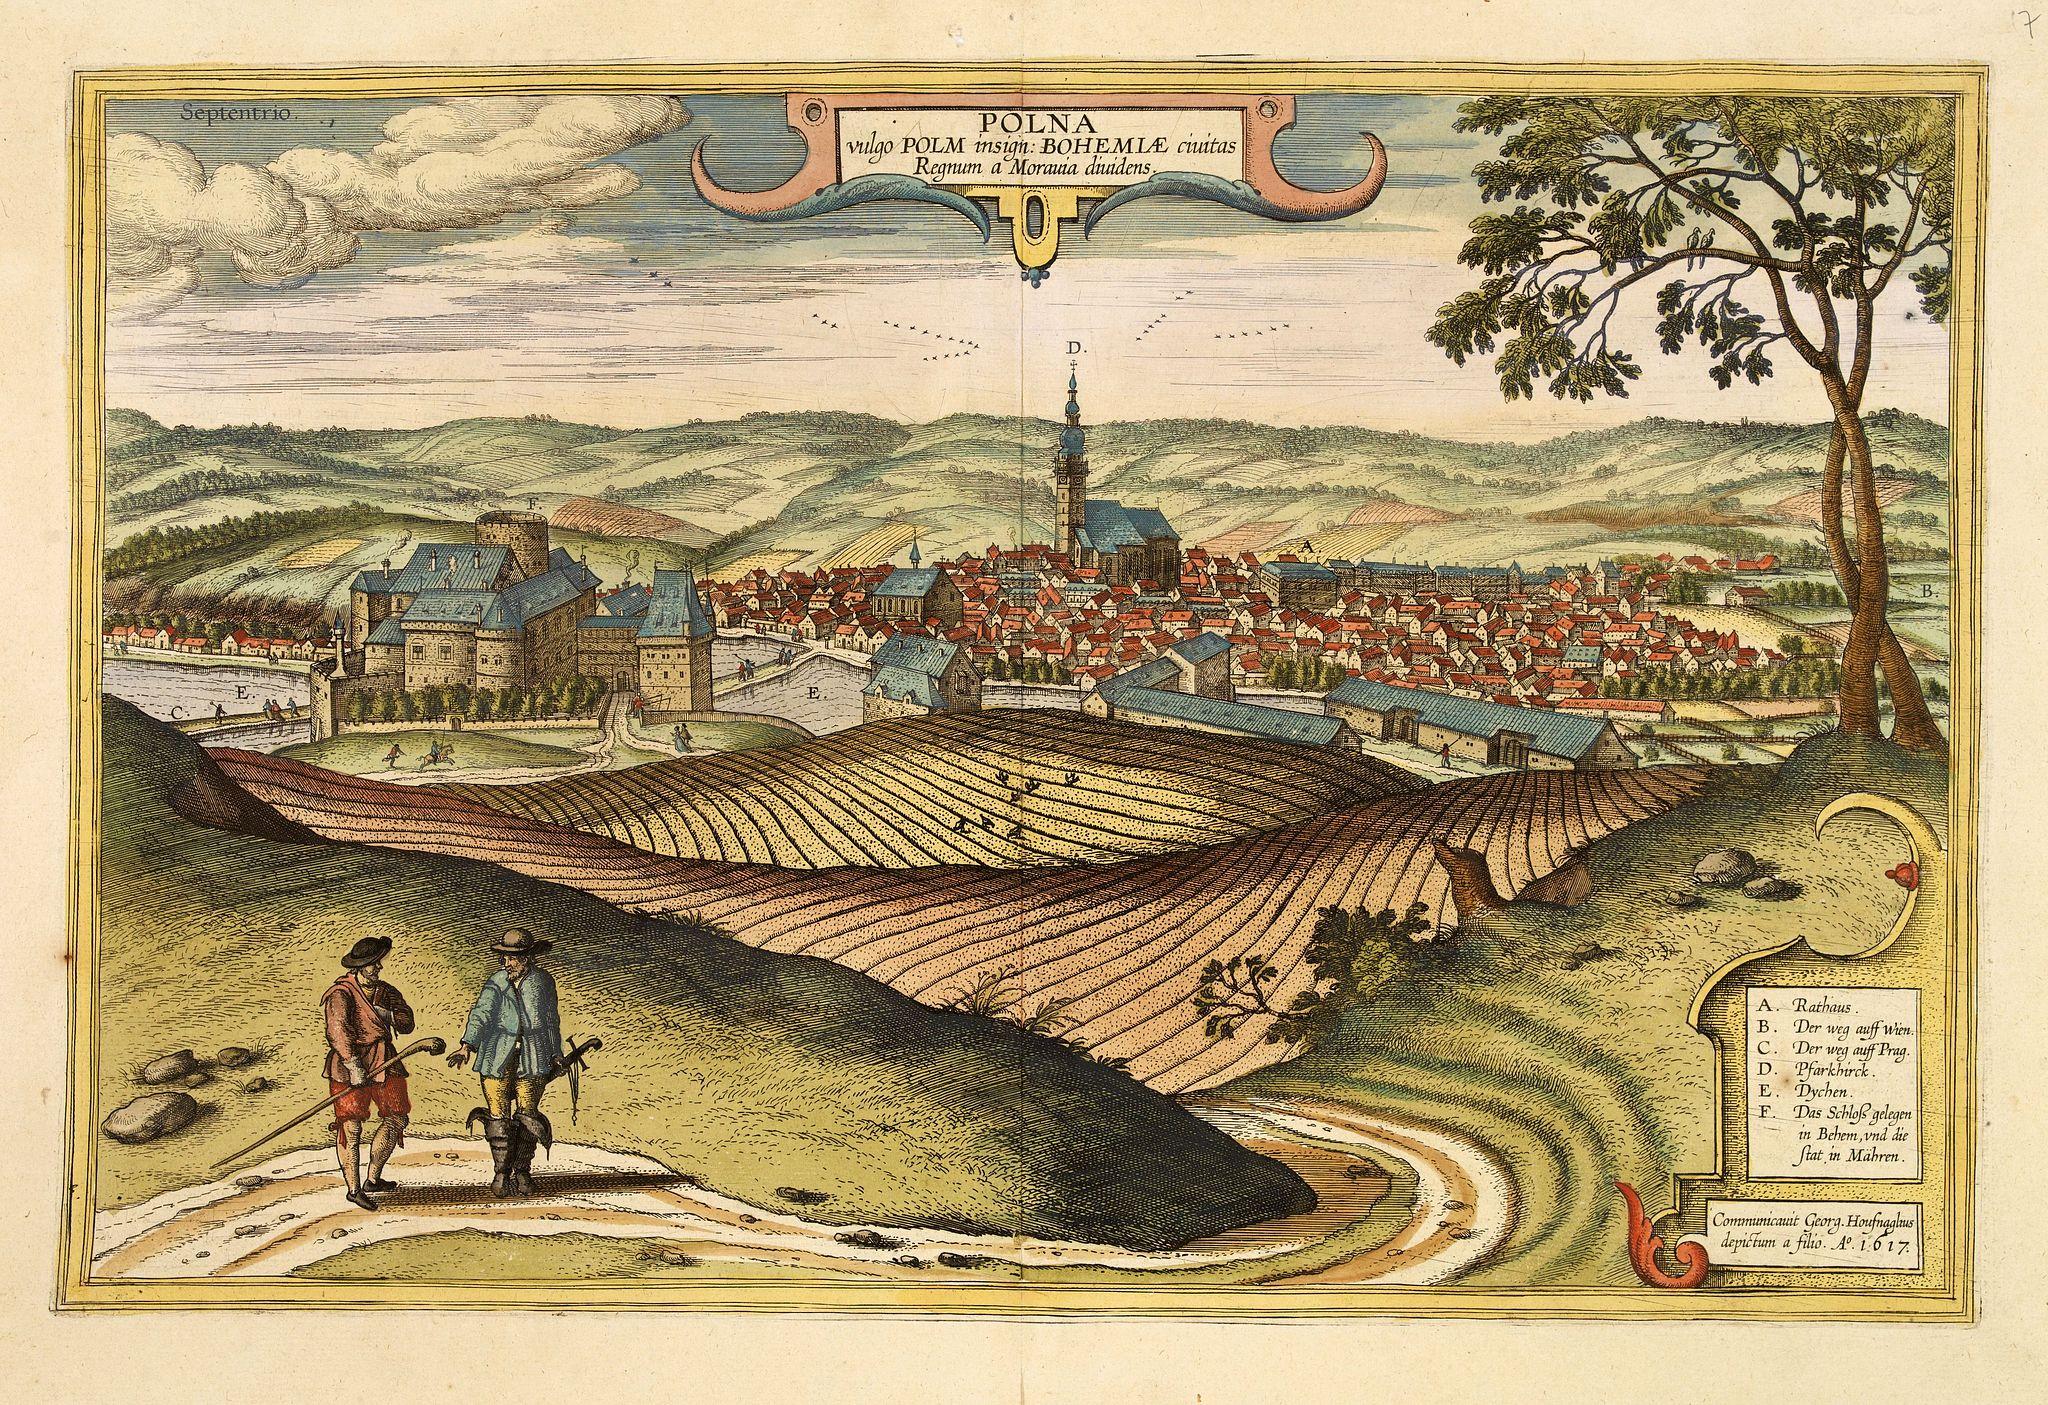 BRAUN, G. / HOGENBERG, F. -  Polna vulgo Polm insign : Bohemia.